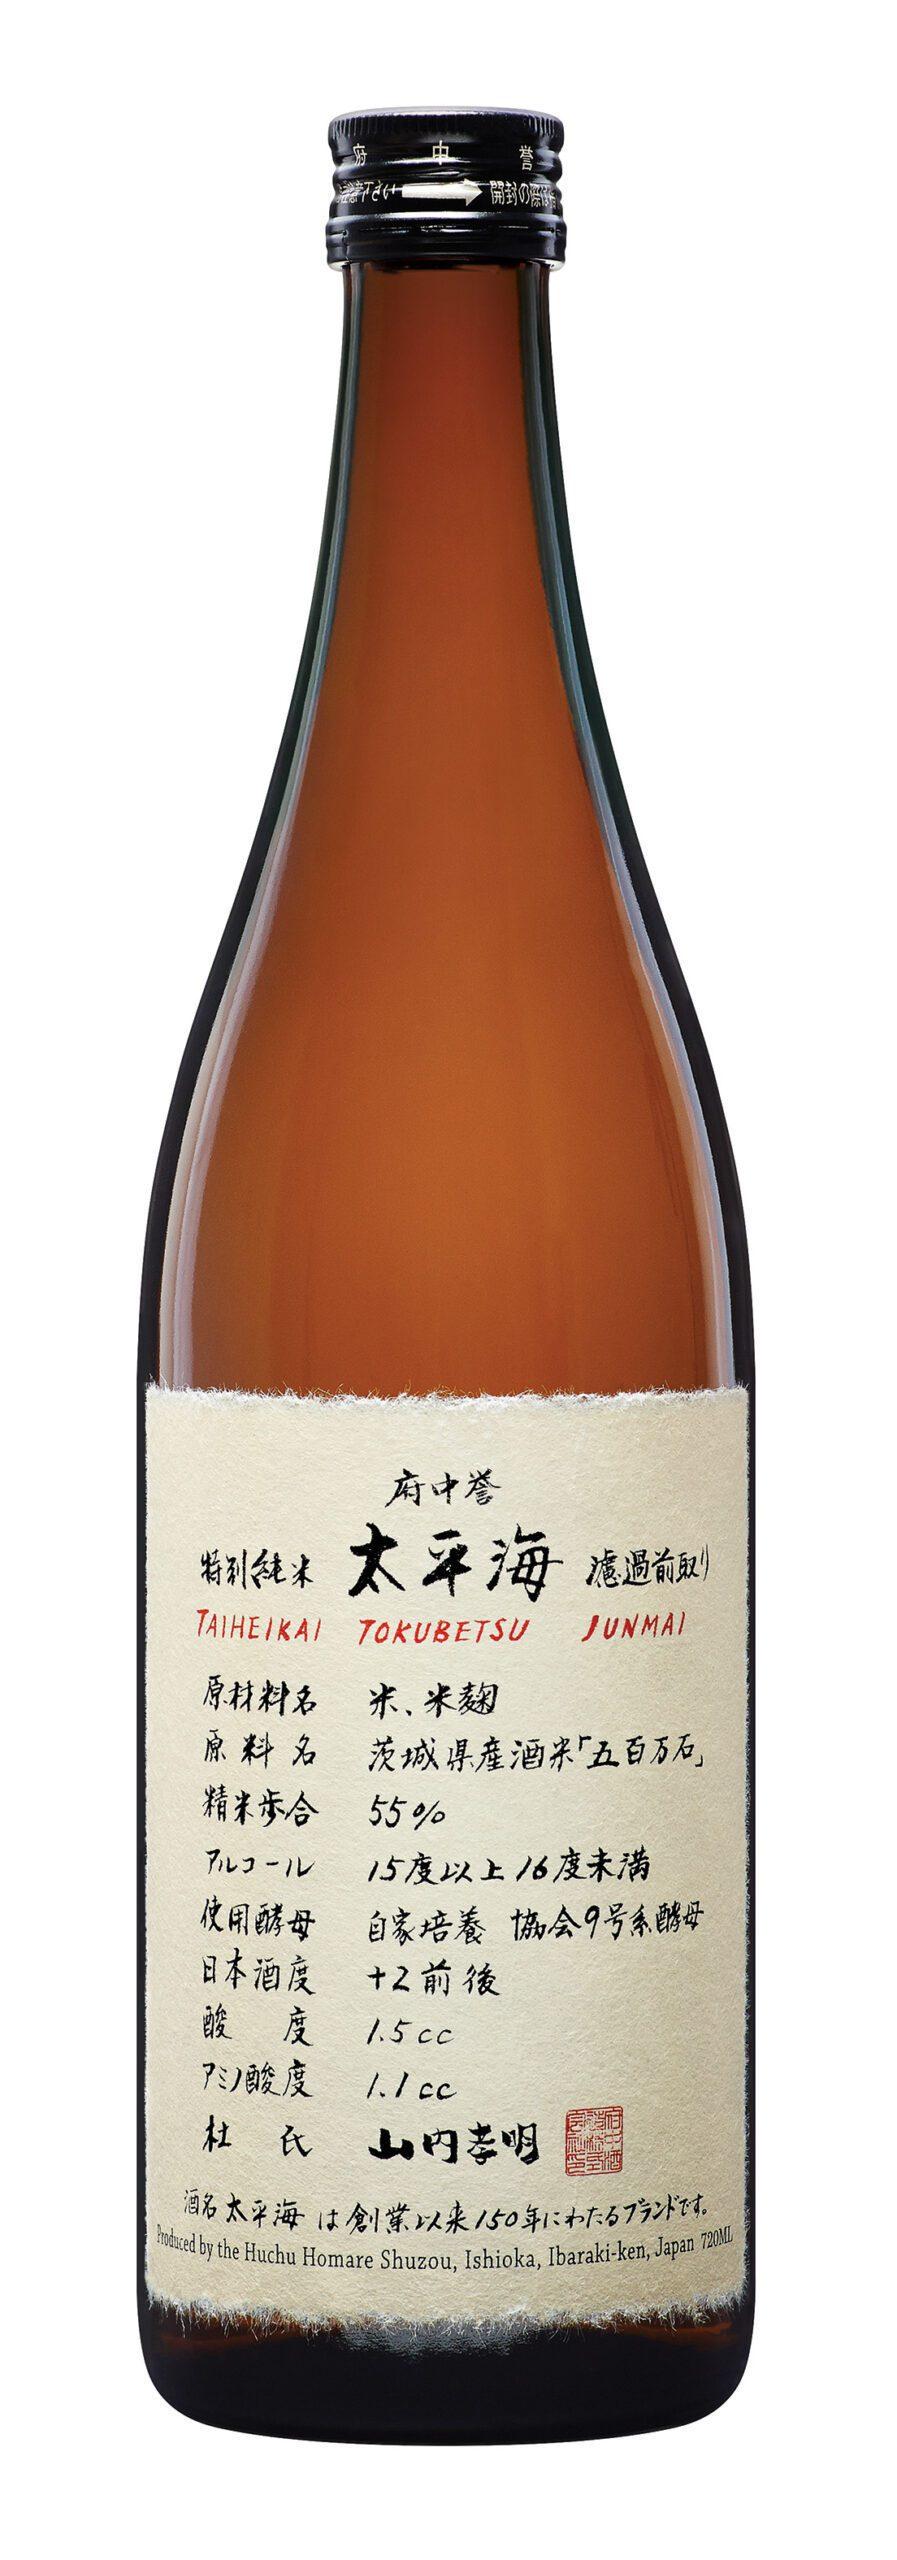 Taiheikai - Tokubetsu Junmai